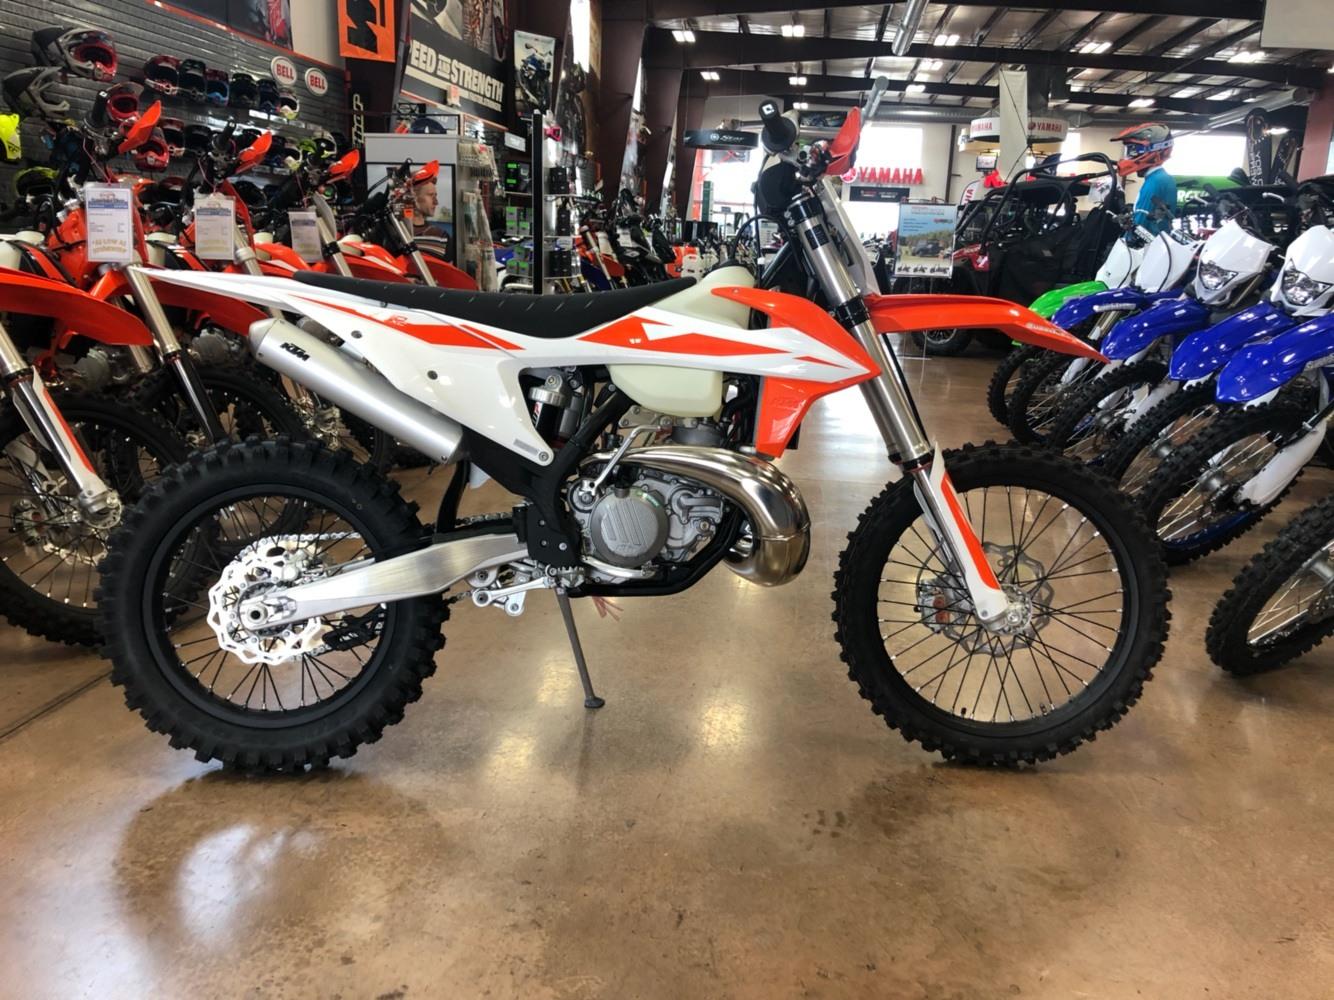 2019 KTM 250 XC for sale 972